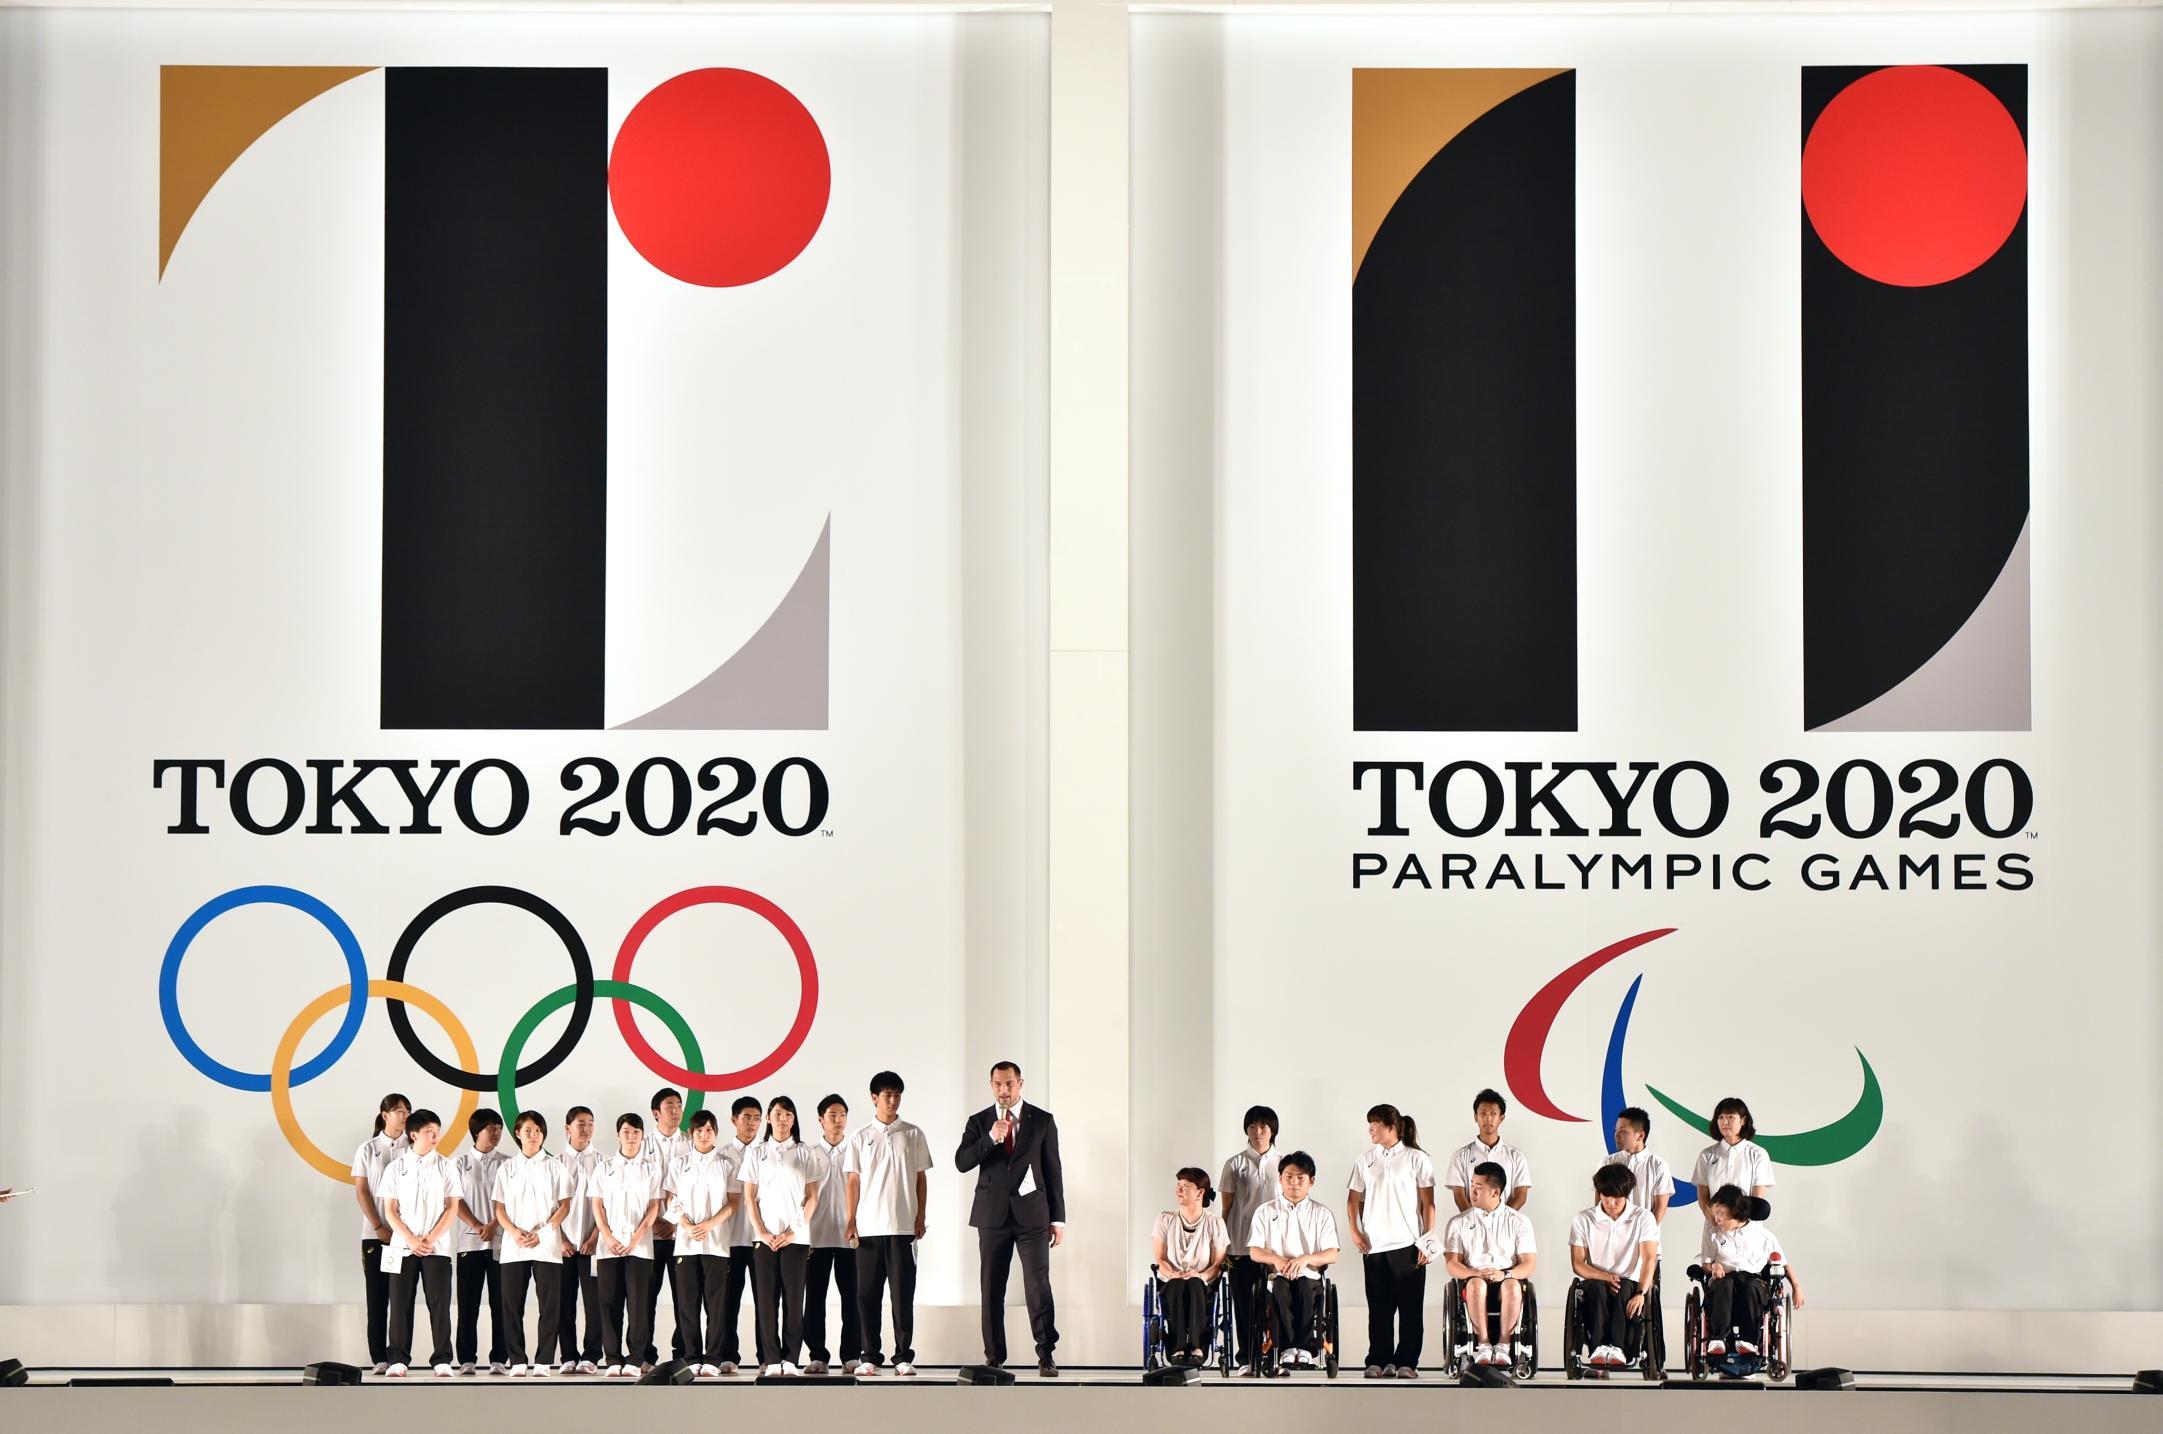 Olympics: Tokyo logo design ruffles feathers abroad